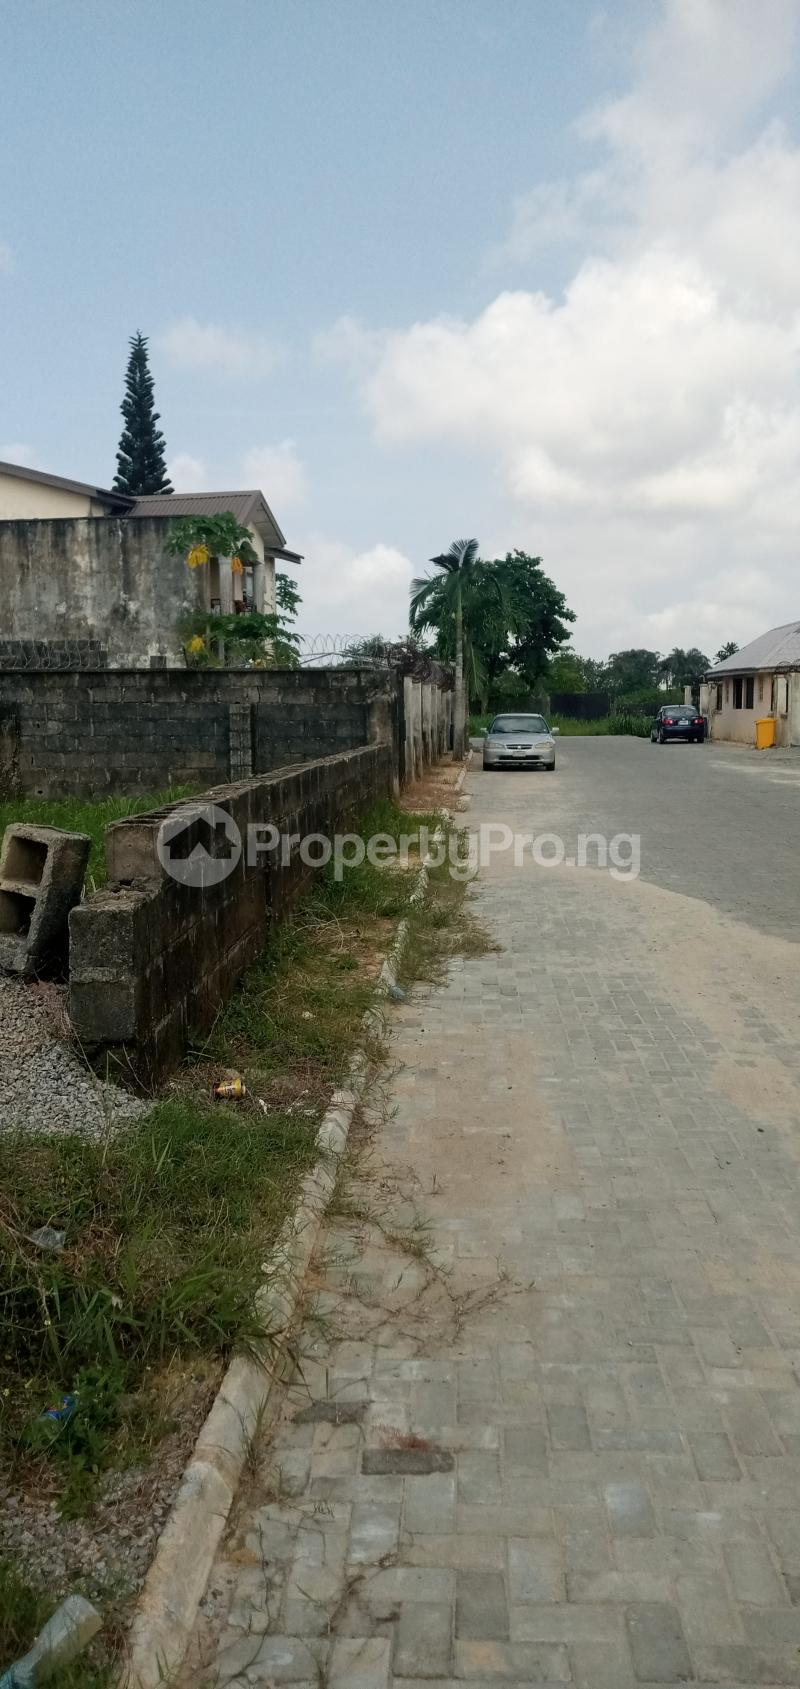 Residential Land Land for sale Paved  Road,  Eden garden Estate Ajah Lagos - 5